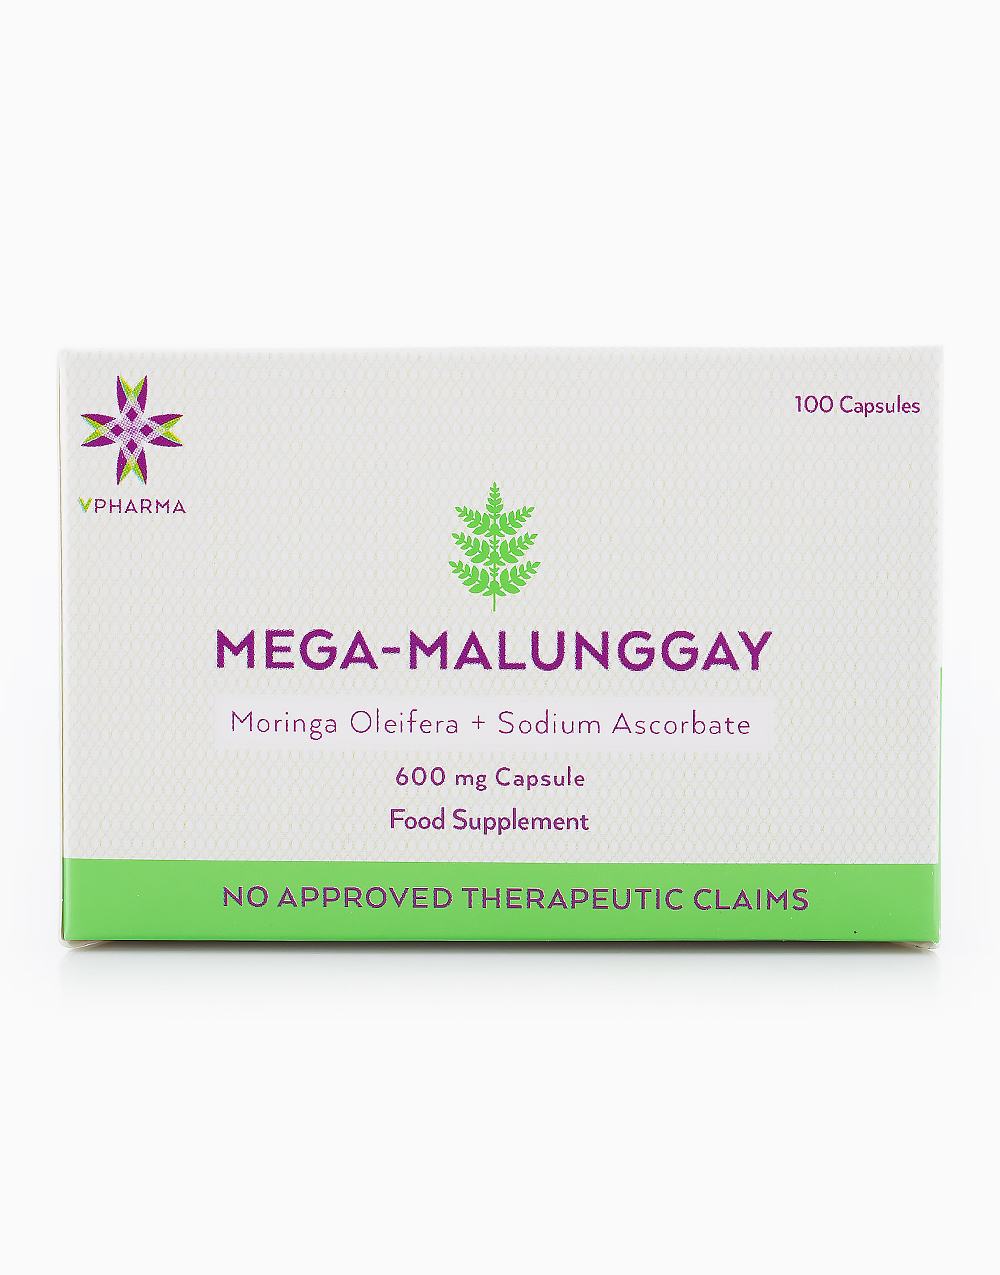 Mega-Malunggay (3 x 100 Capsules) by VPharma